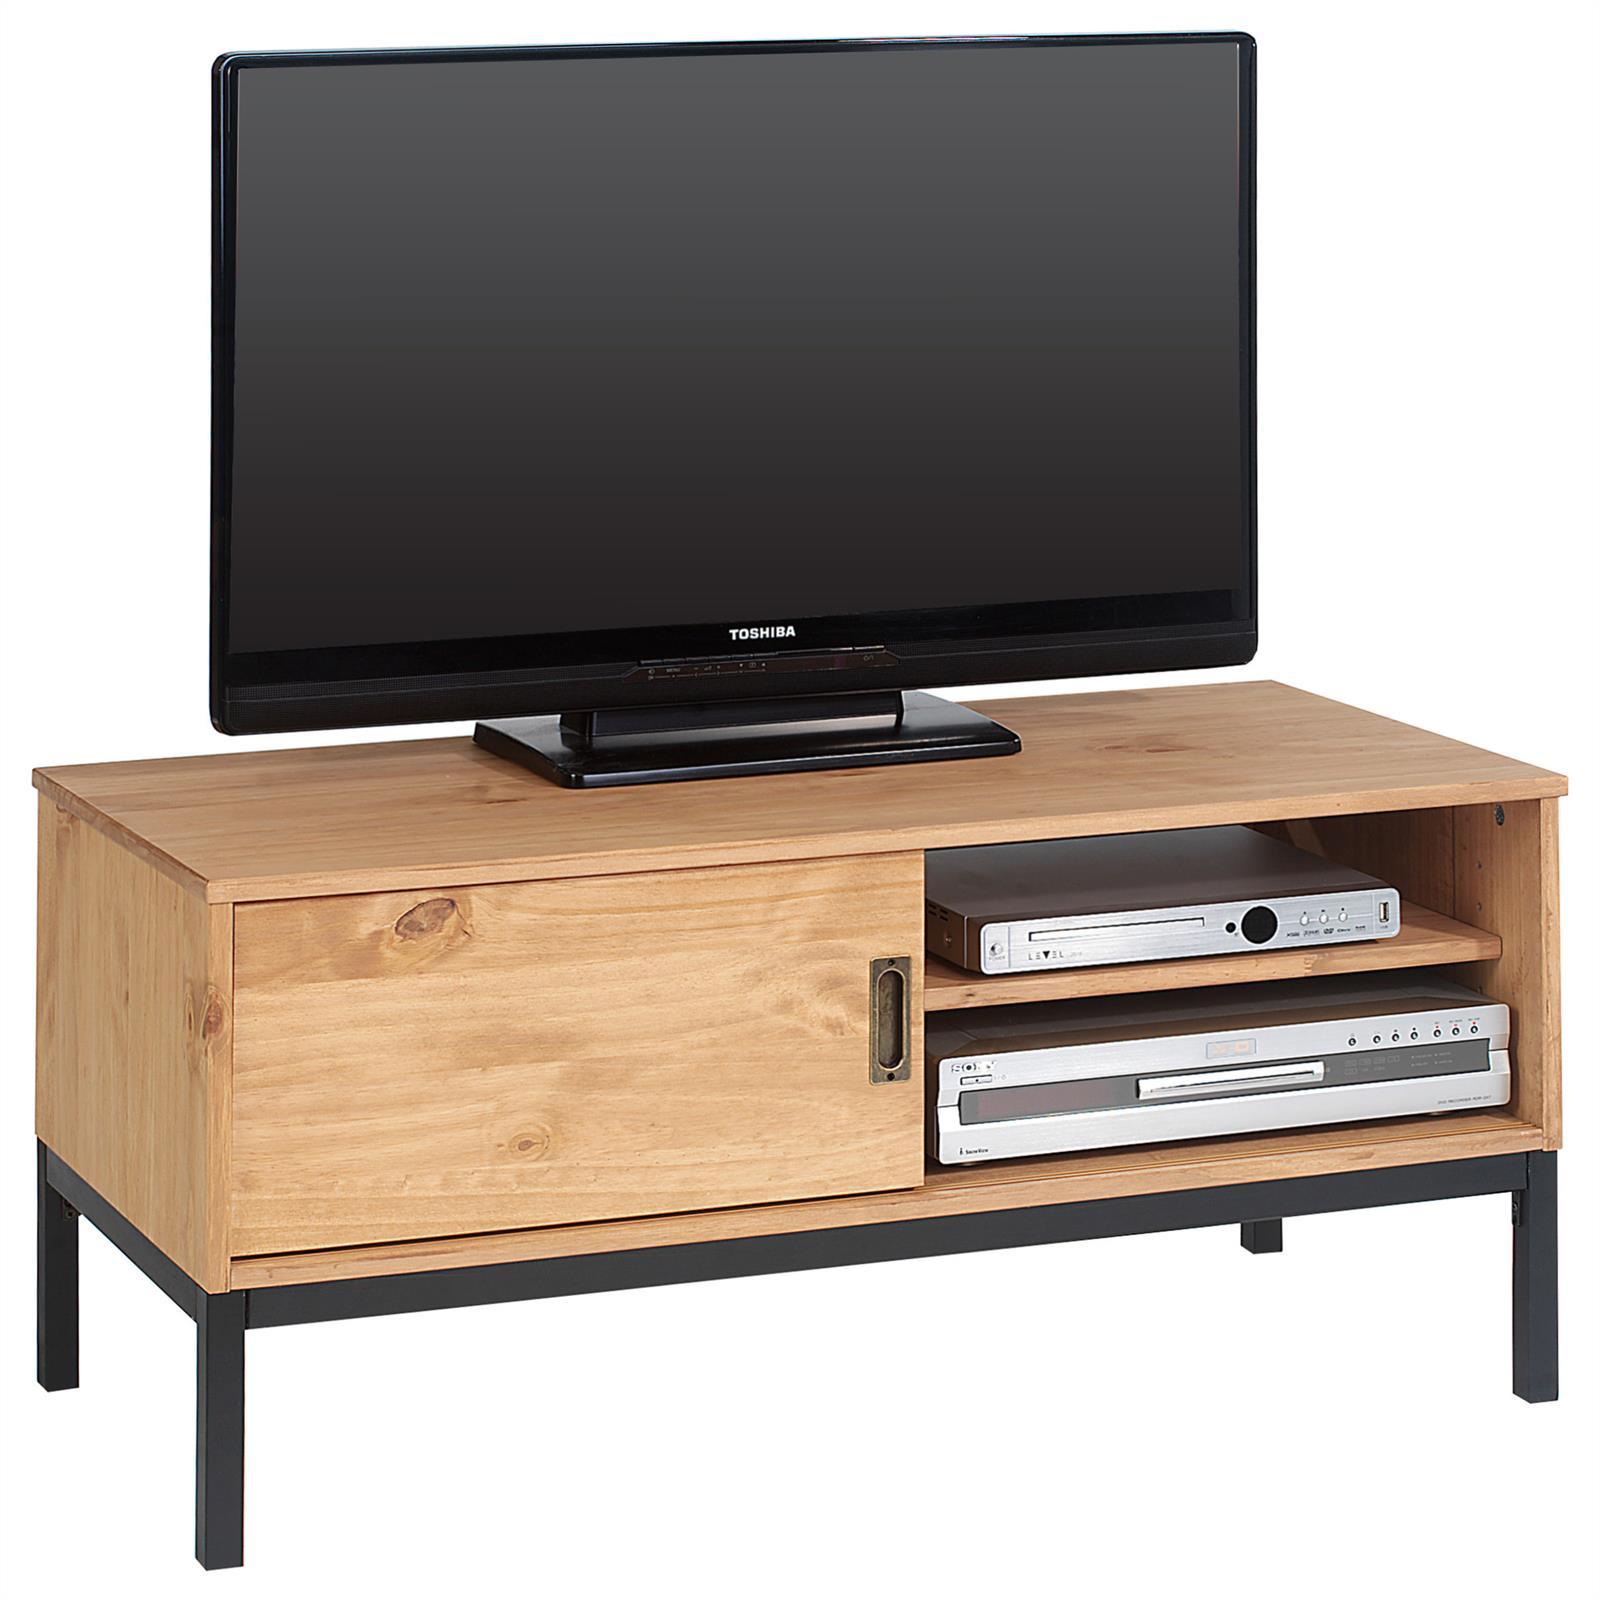 meuble tv selma 1 porte coulissante teint brun clair mobil meubles. Black Bedroom Furniture Sets. Home Design Ideas